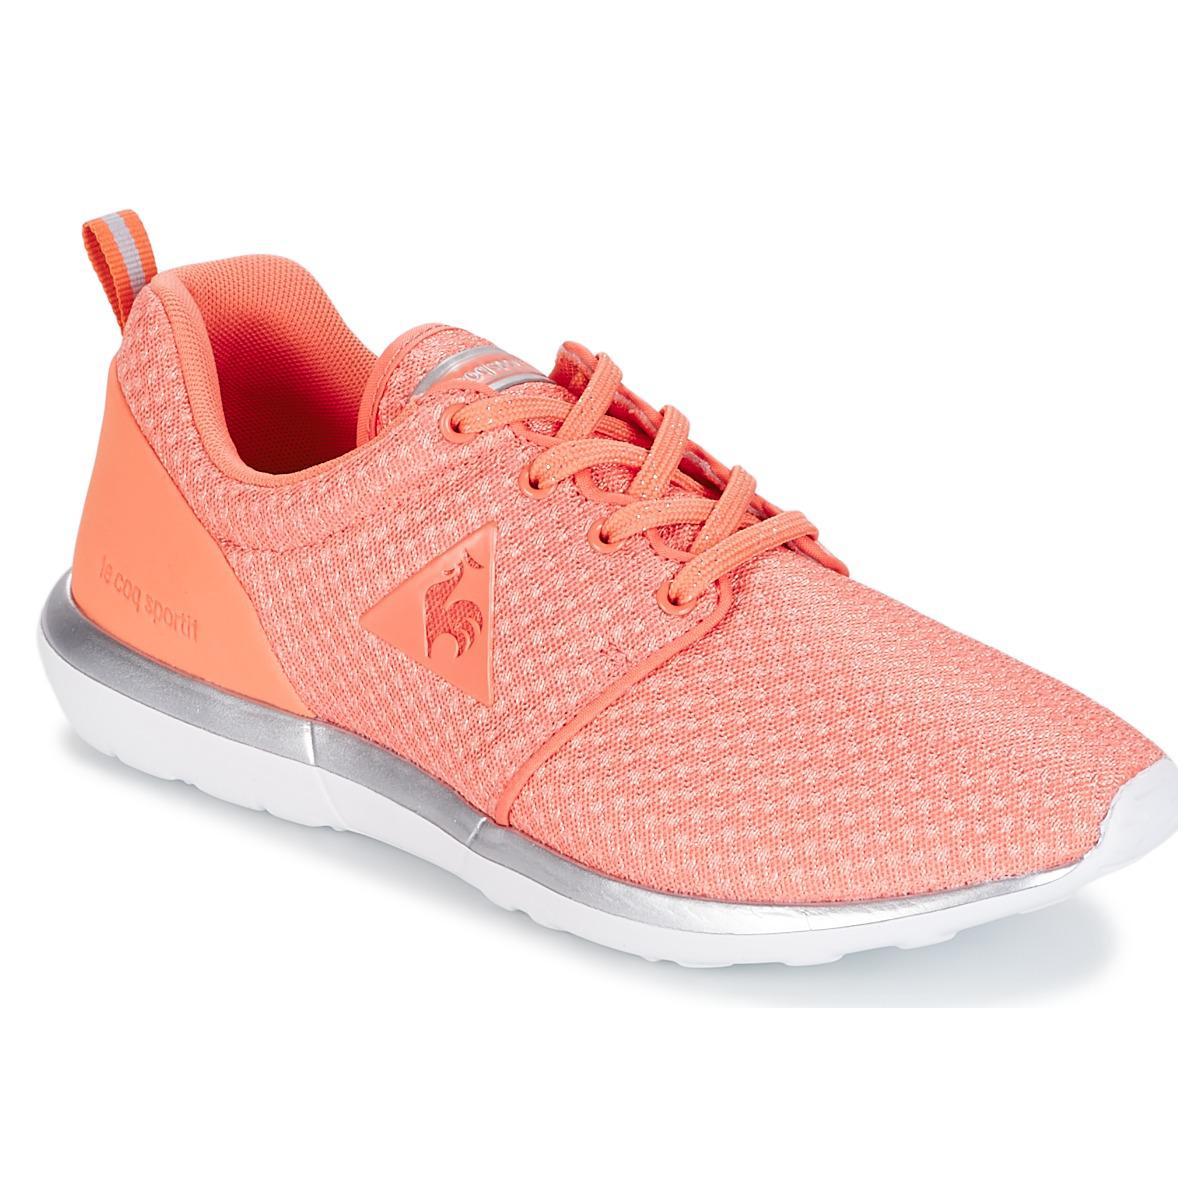 147dc999cf2b Le Coq Sportif Dynacomf W Feminine Mesh metallic Women s Shoes ...